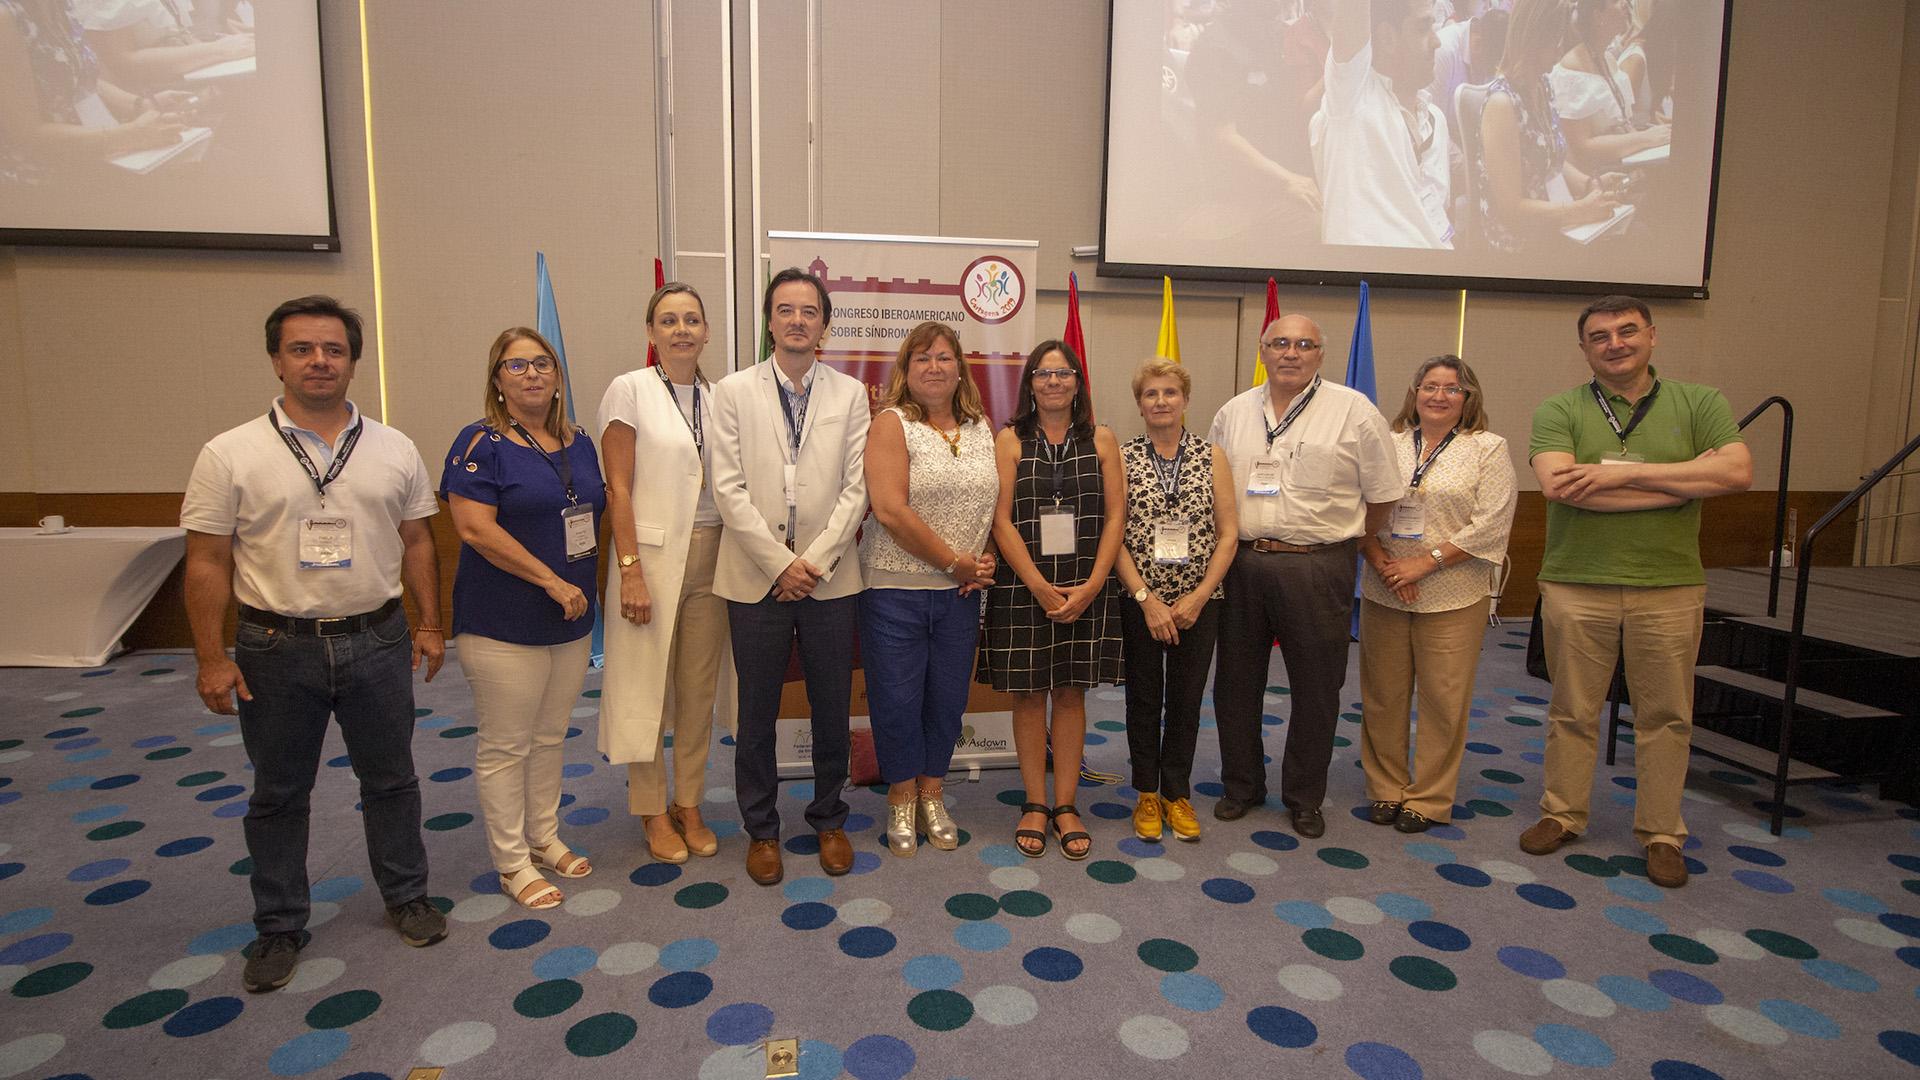 La Federación Iberoamericana de Síndrome de Down